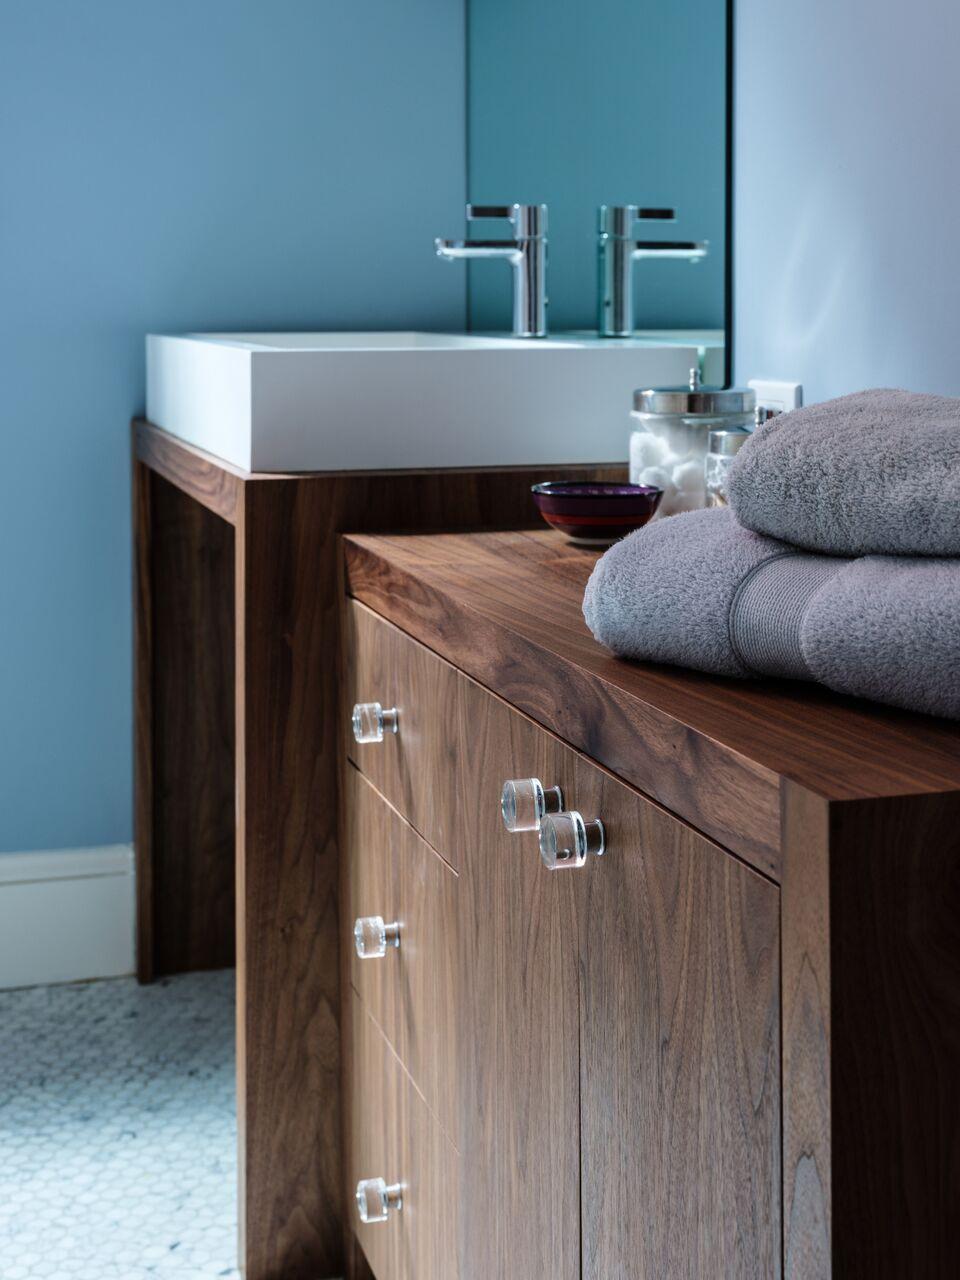 Master Bath, Washington, DC, Virginia Mountain Woodworks, Badeloft Sink, Hansgrohe Faucet, Bel Pre Glass